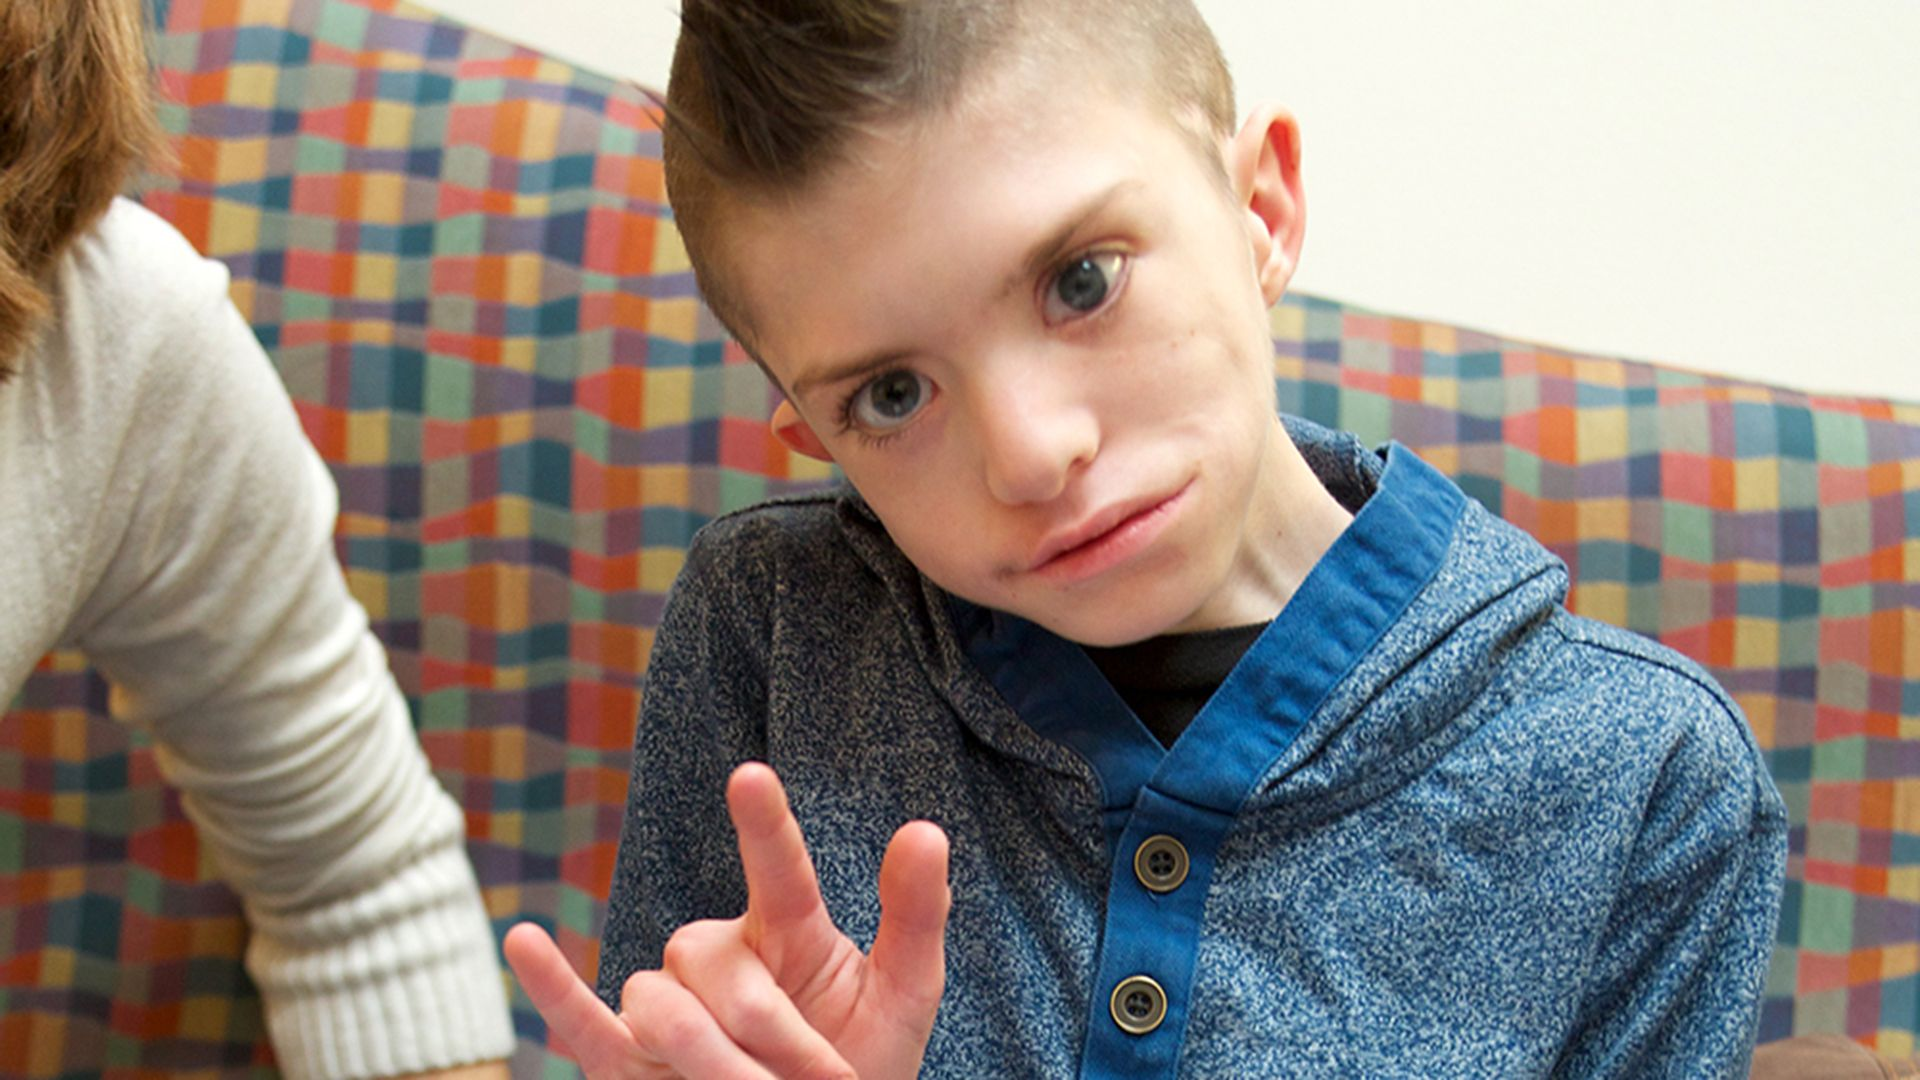 Boy with rare facial paralyzing disorder has special Christmas wish: a smile